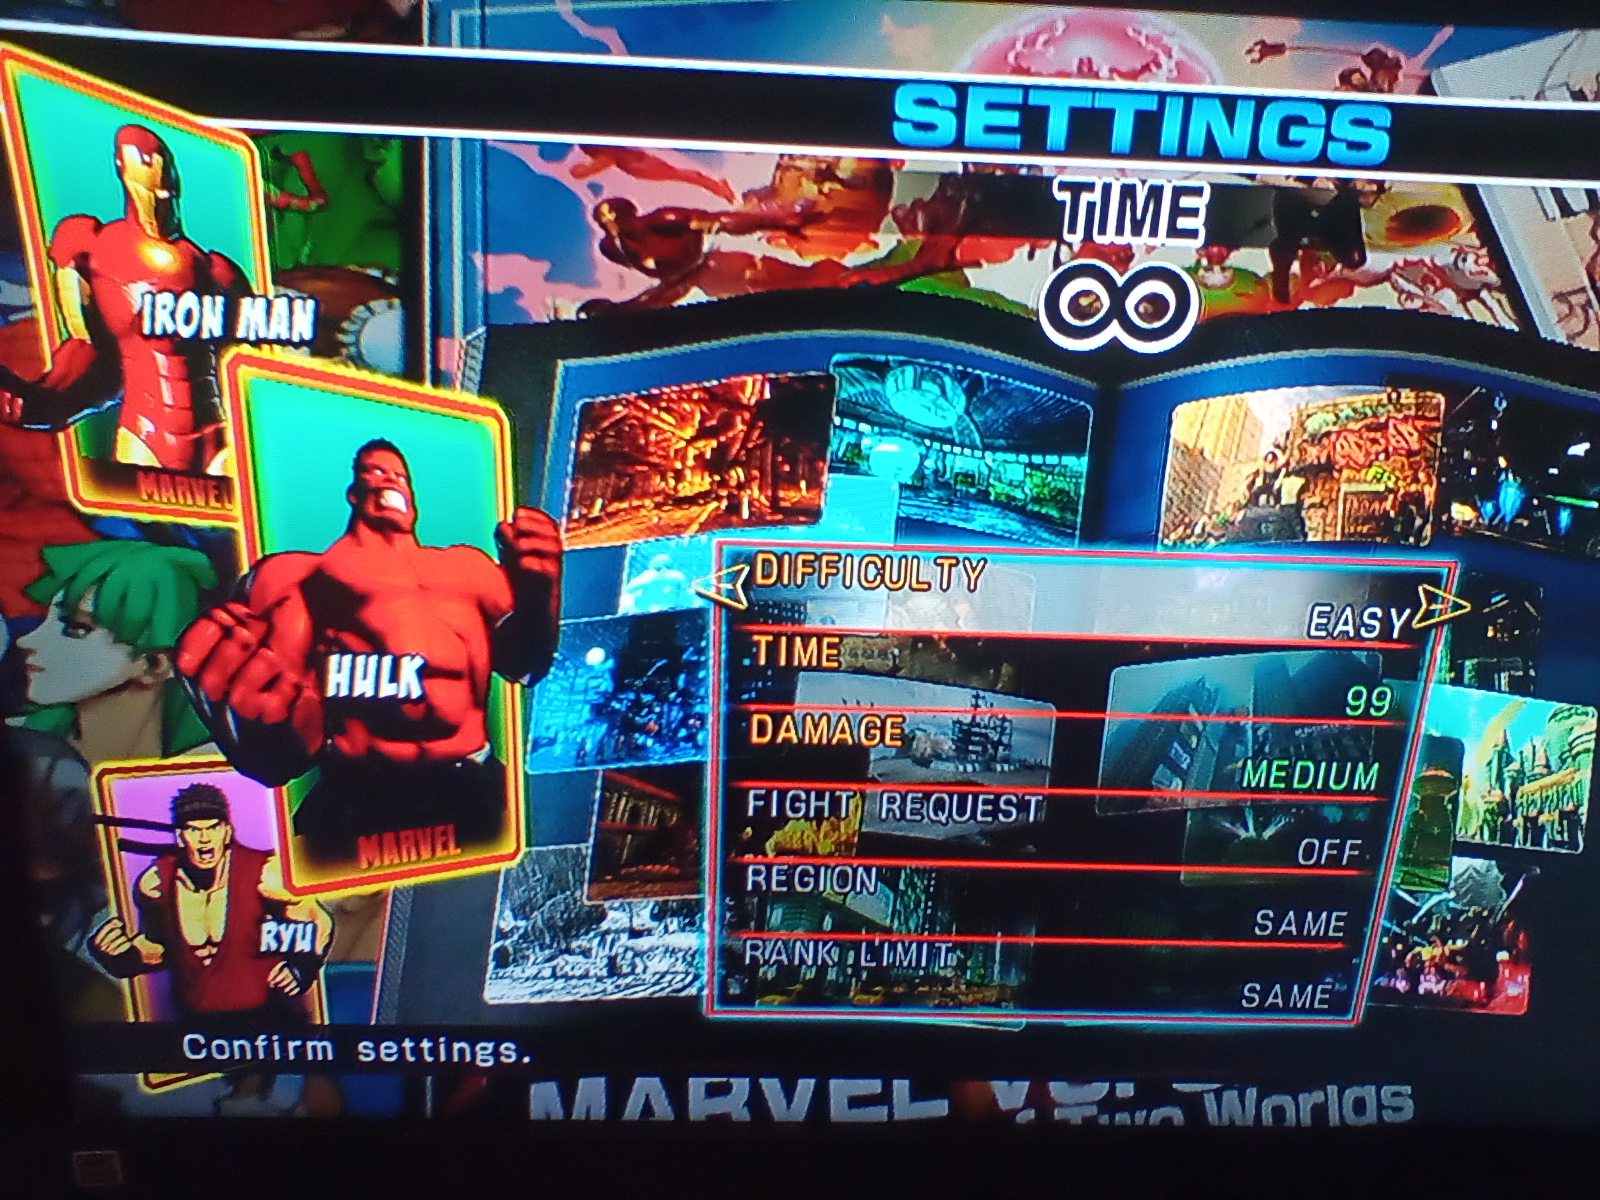 JML101582: Ultimate Marvel vs. Capcom 3 [Arcade] [Easy] (Playstation 3) 222,318 points on 2020-04-05 16:28:04